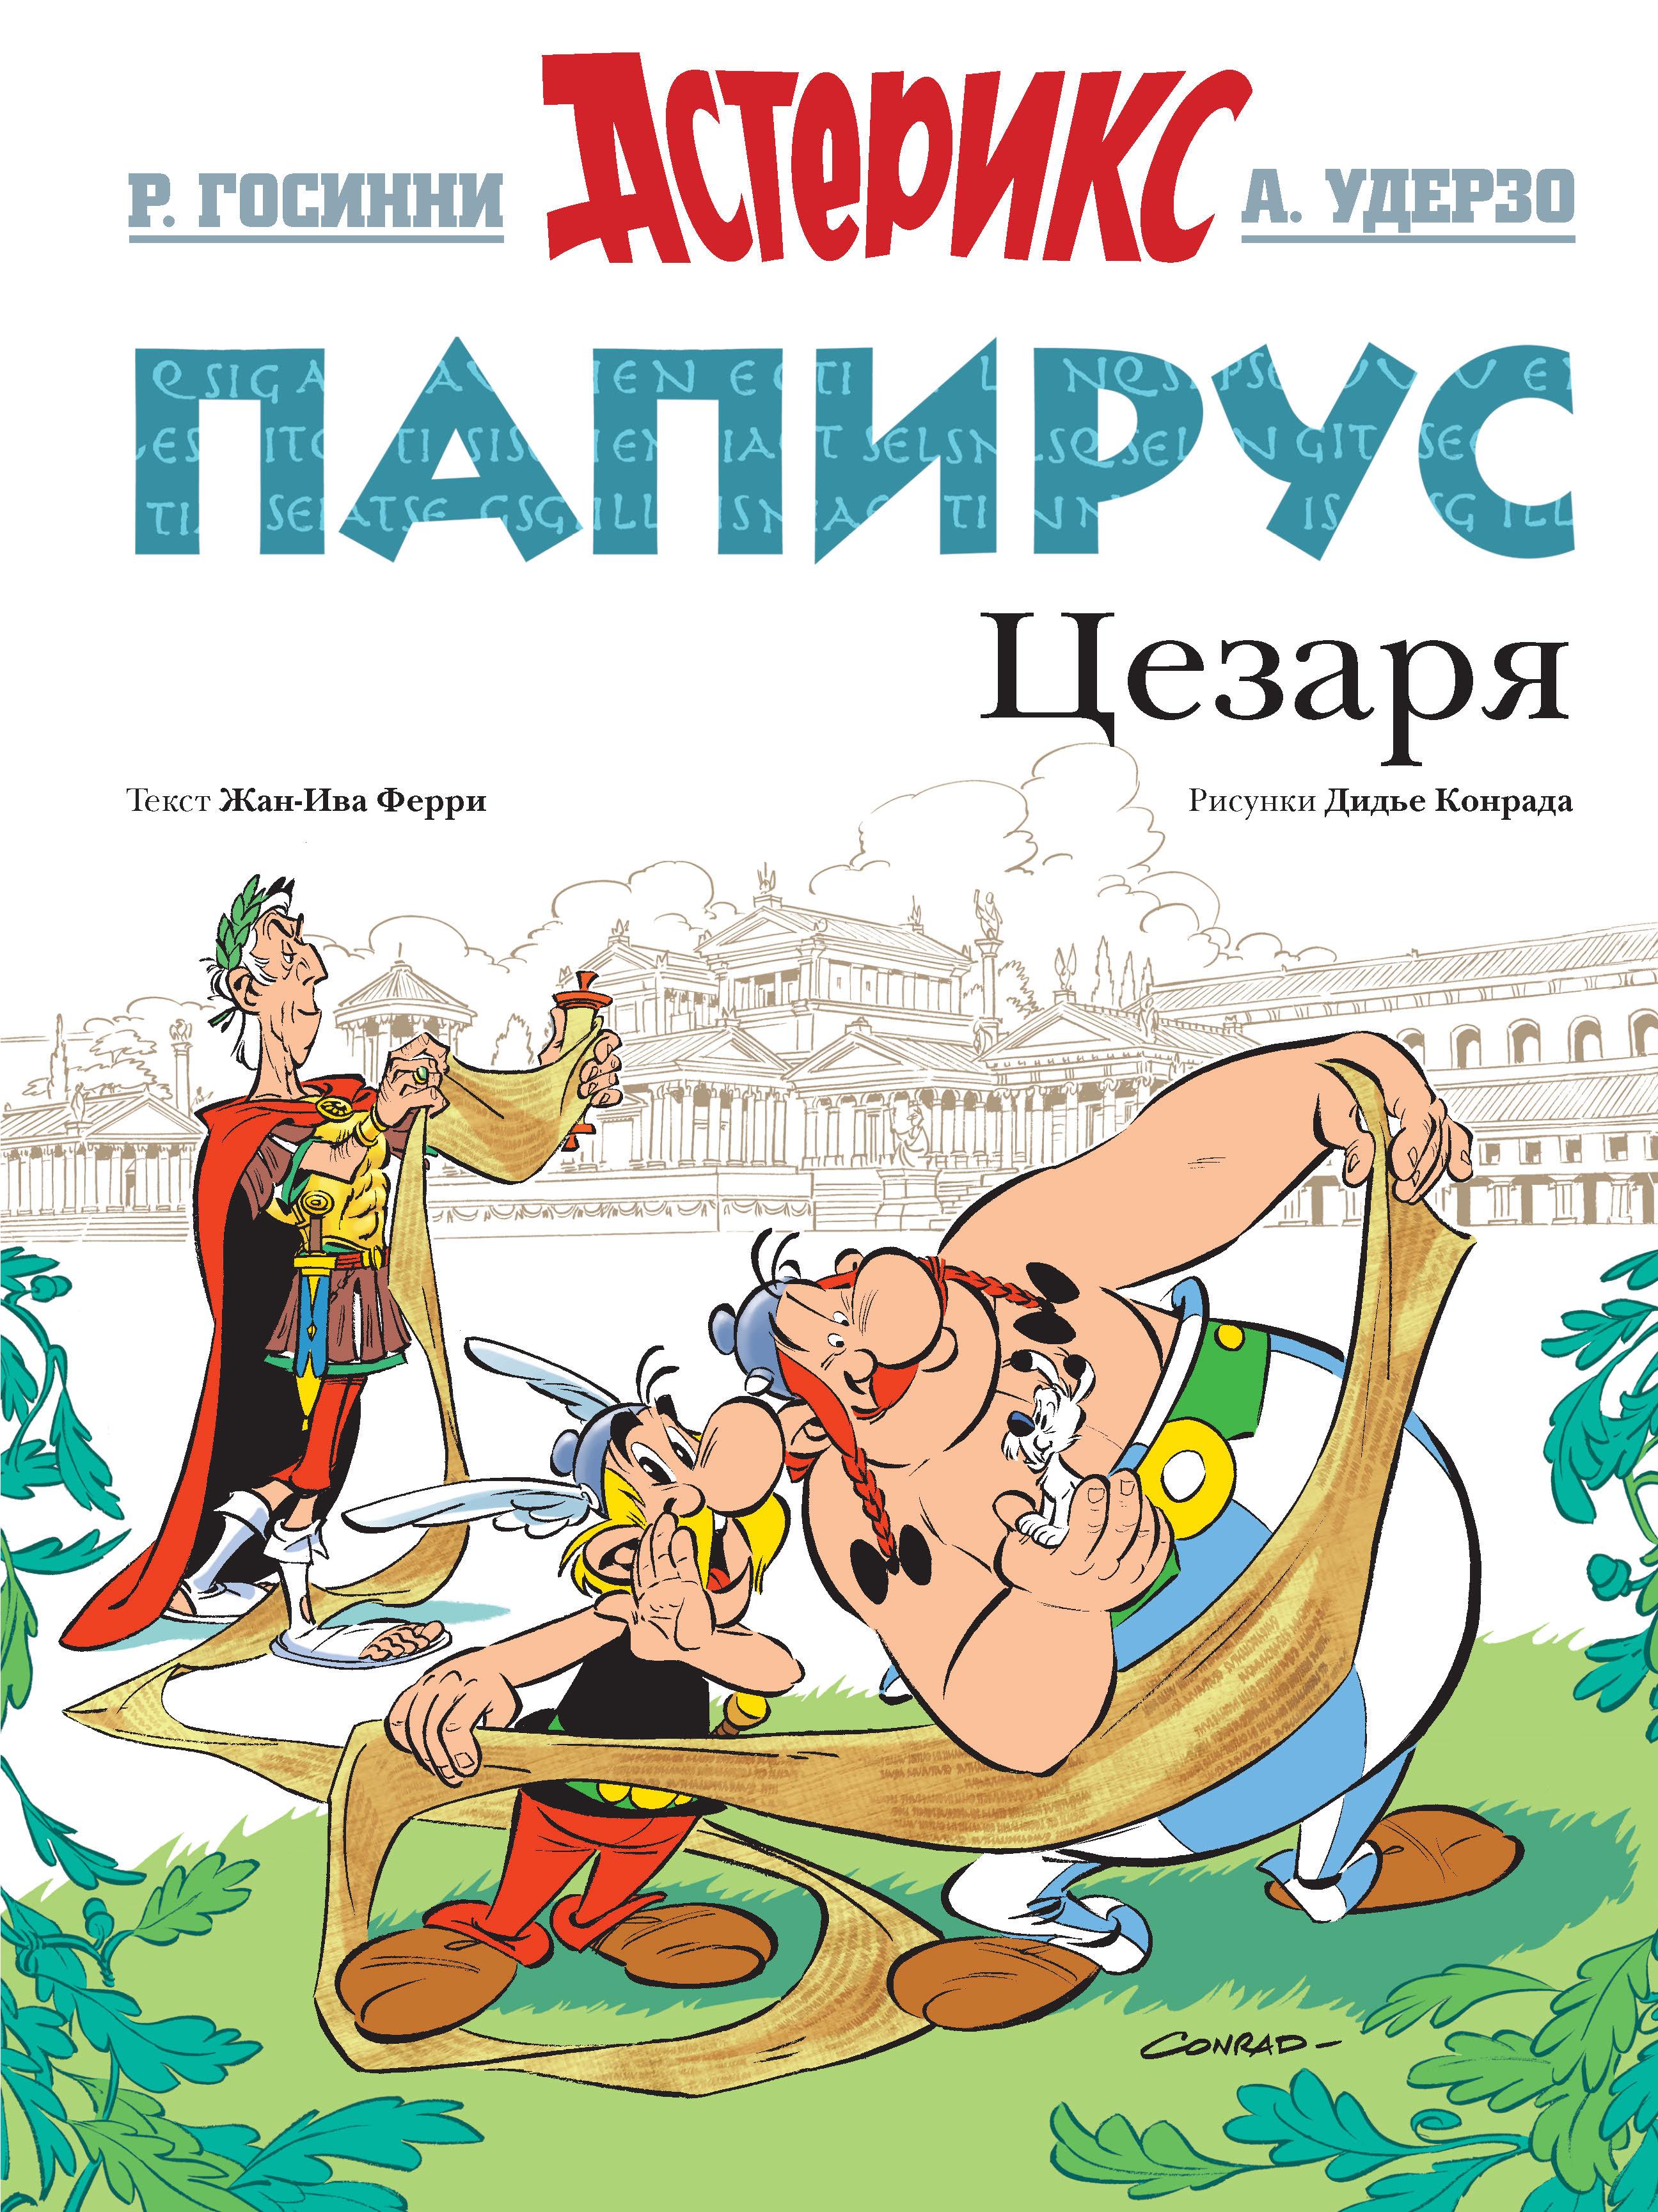 Рене Госинни, Жан-Ив Ферри Папирус Цезаря